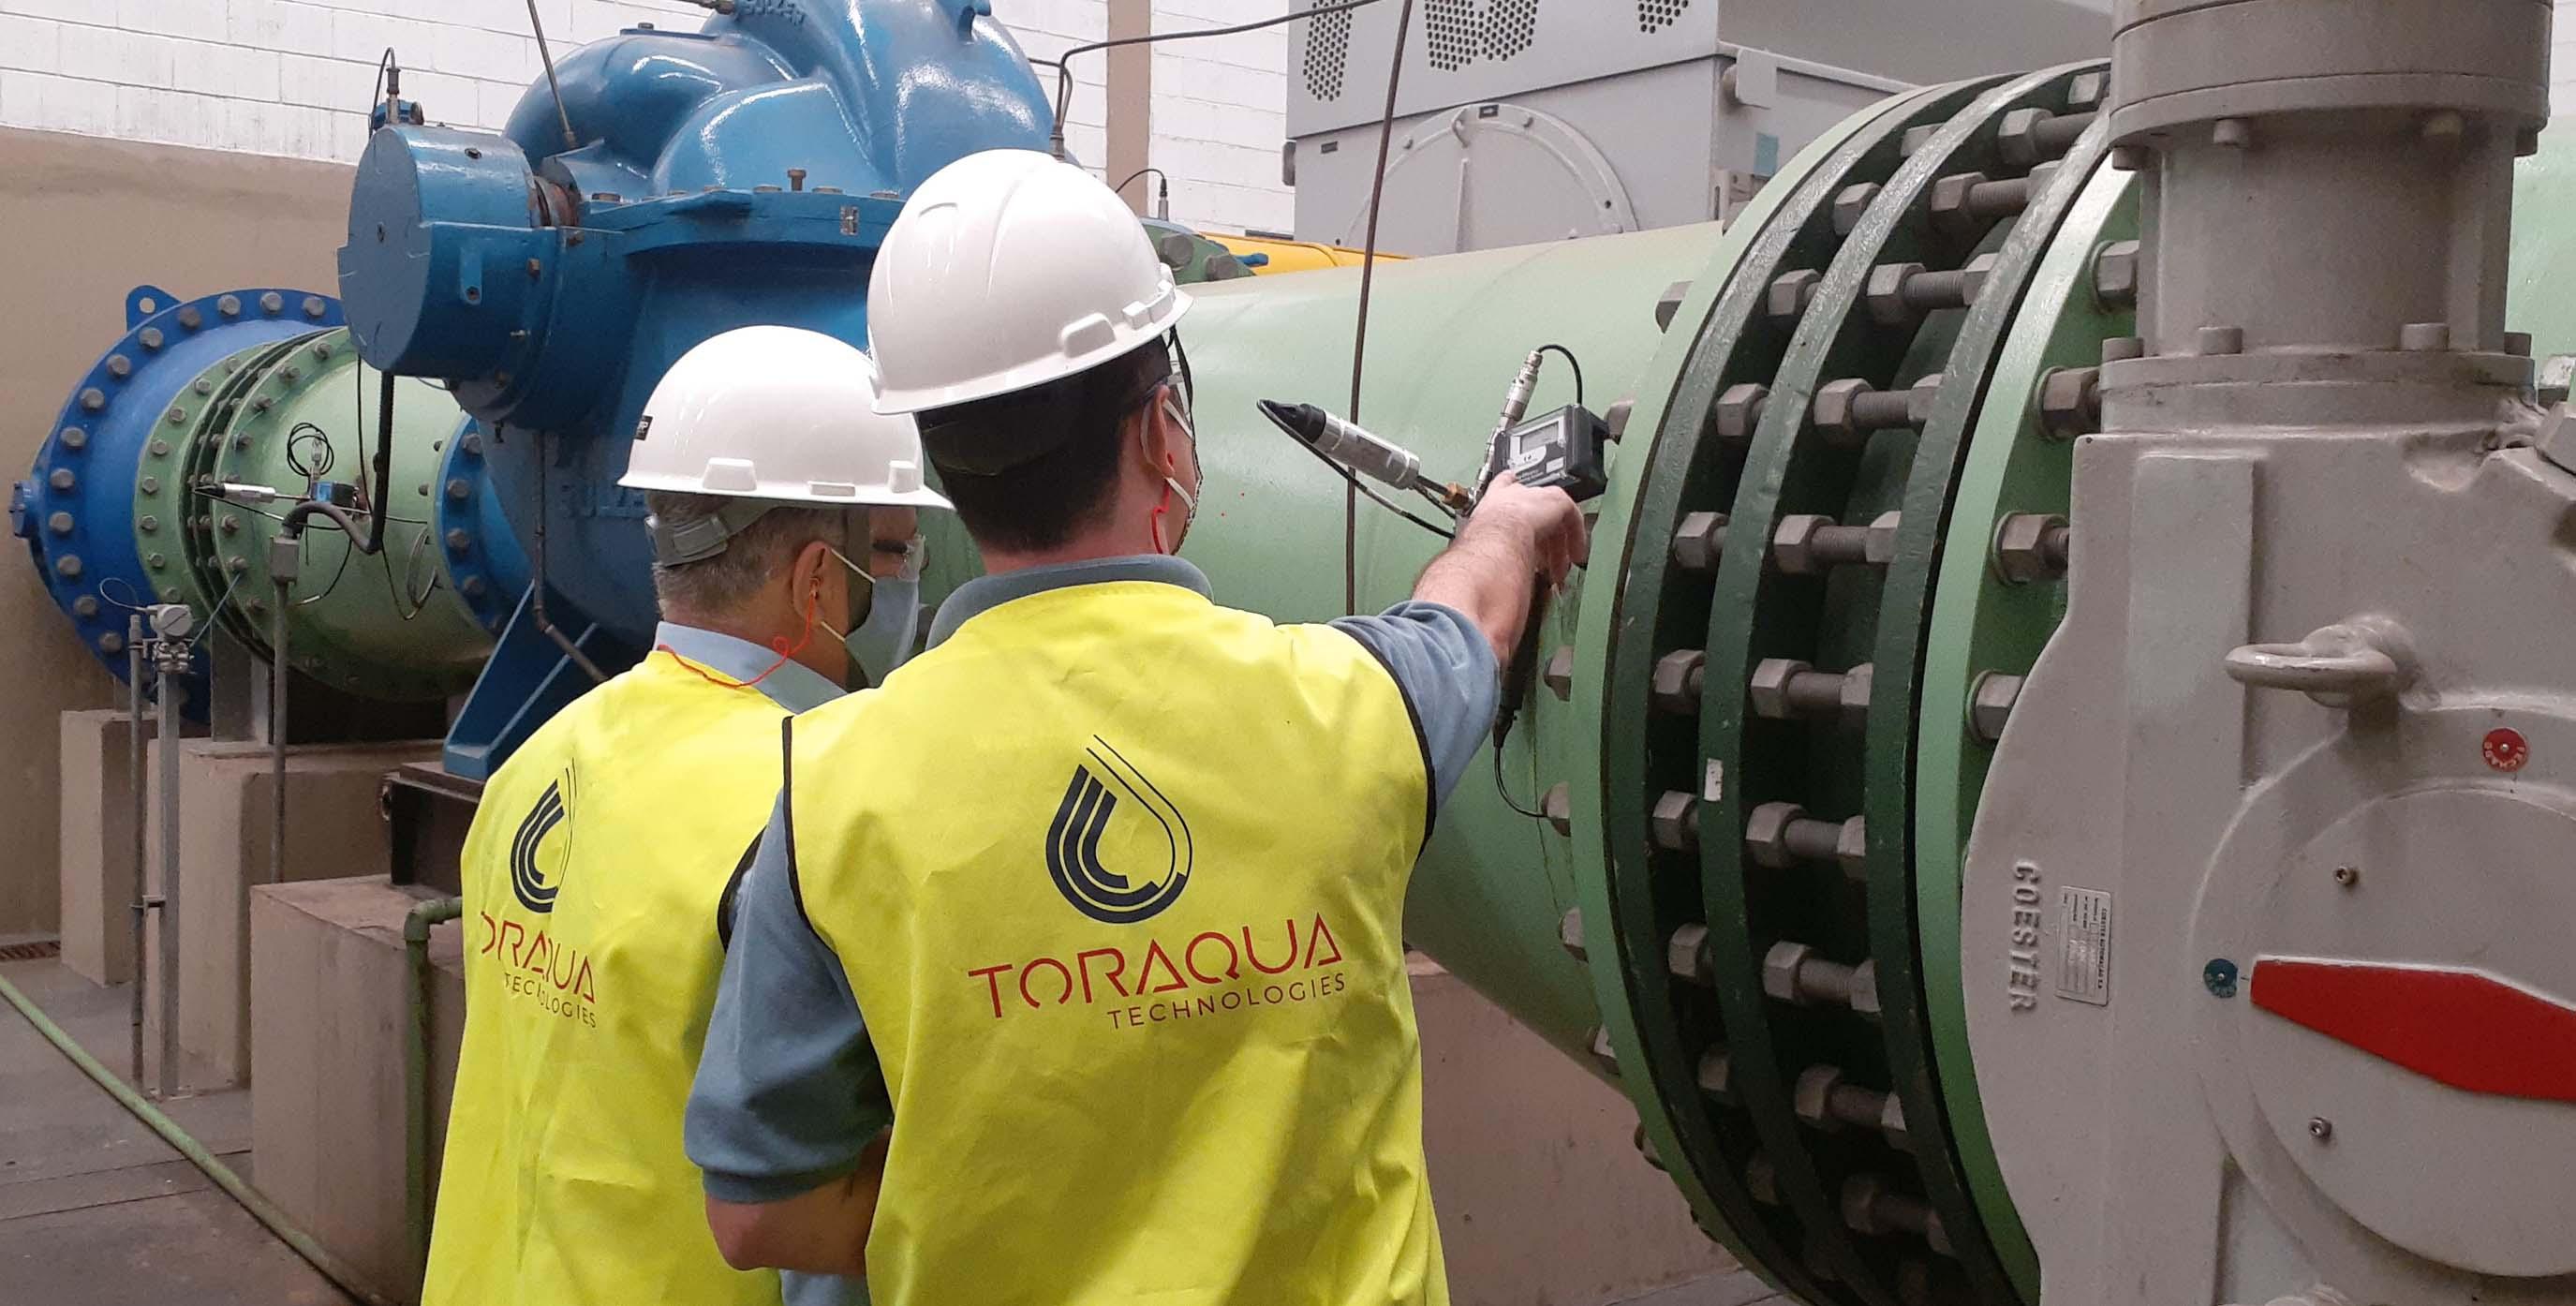 Riventa_Toraqua_Technologies.jpg